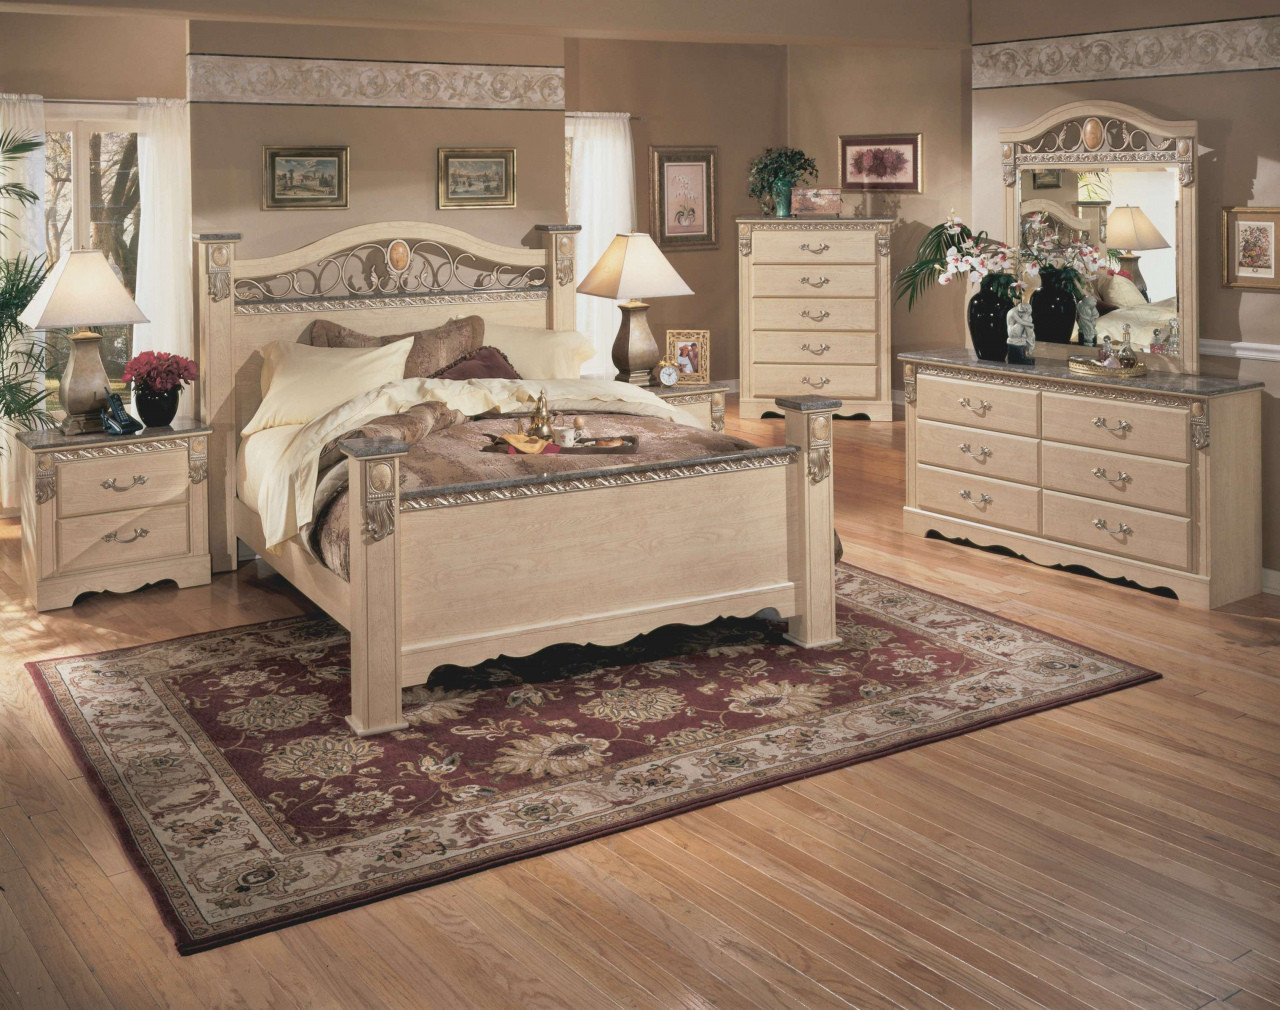 Signature Design by ashley Bedroom Set Elegant ashley Furniture Kids Bedroom Sets ashley Bedroom Set with